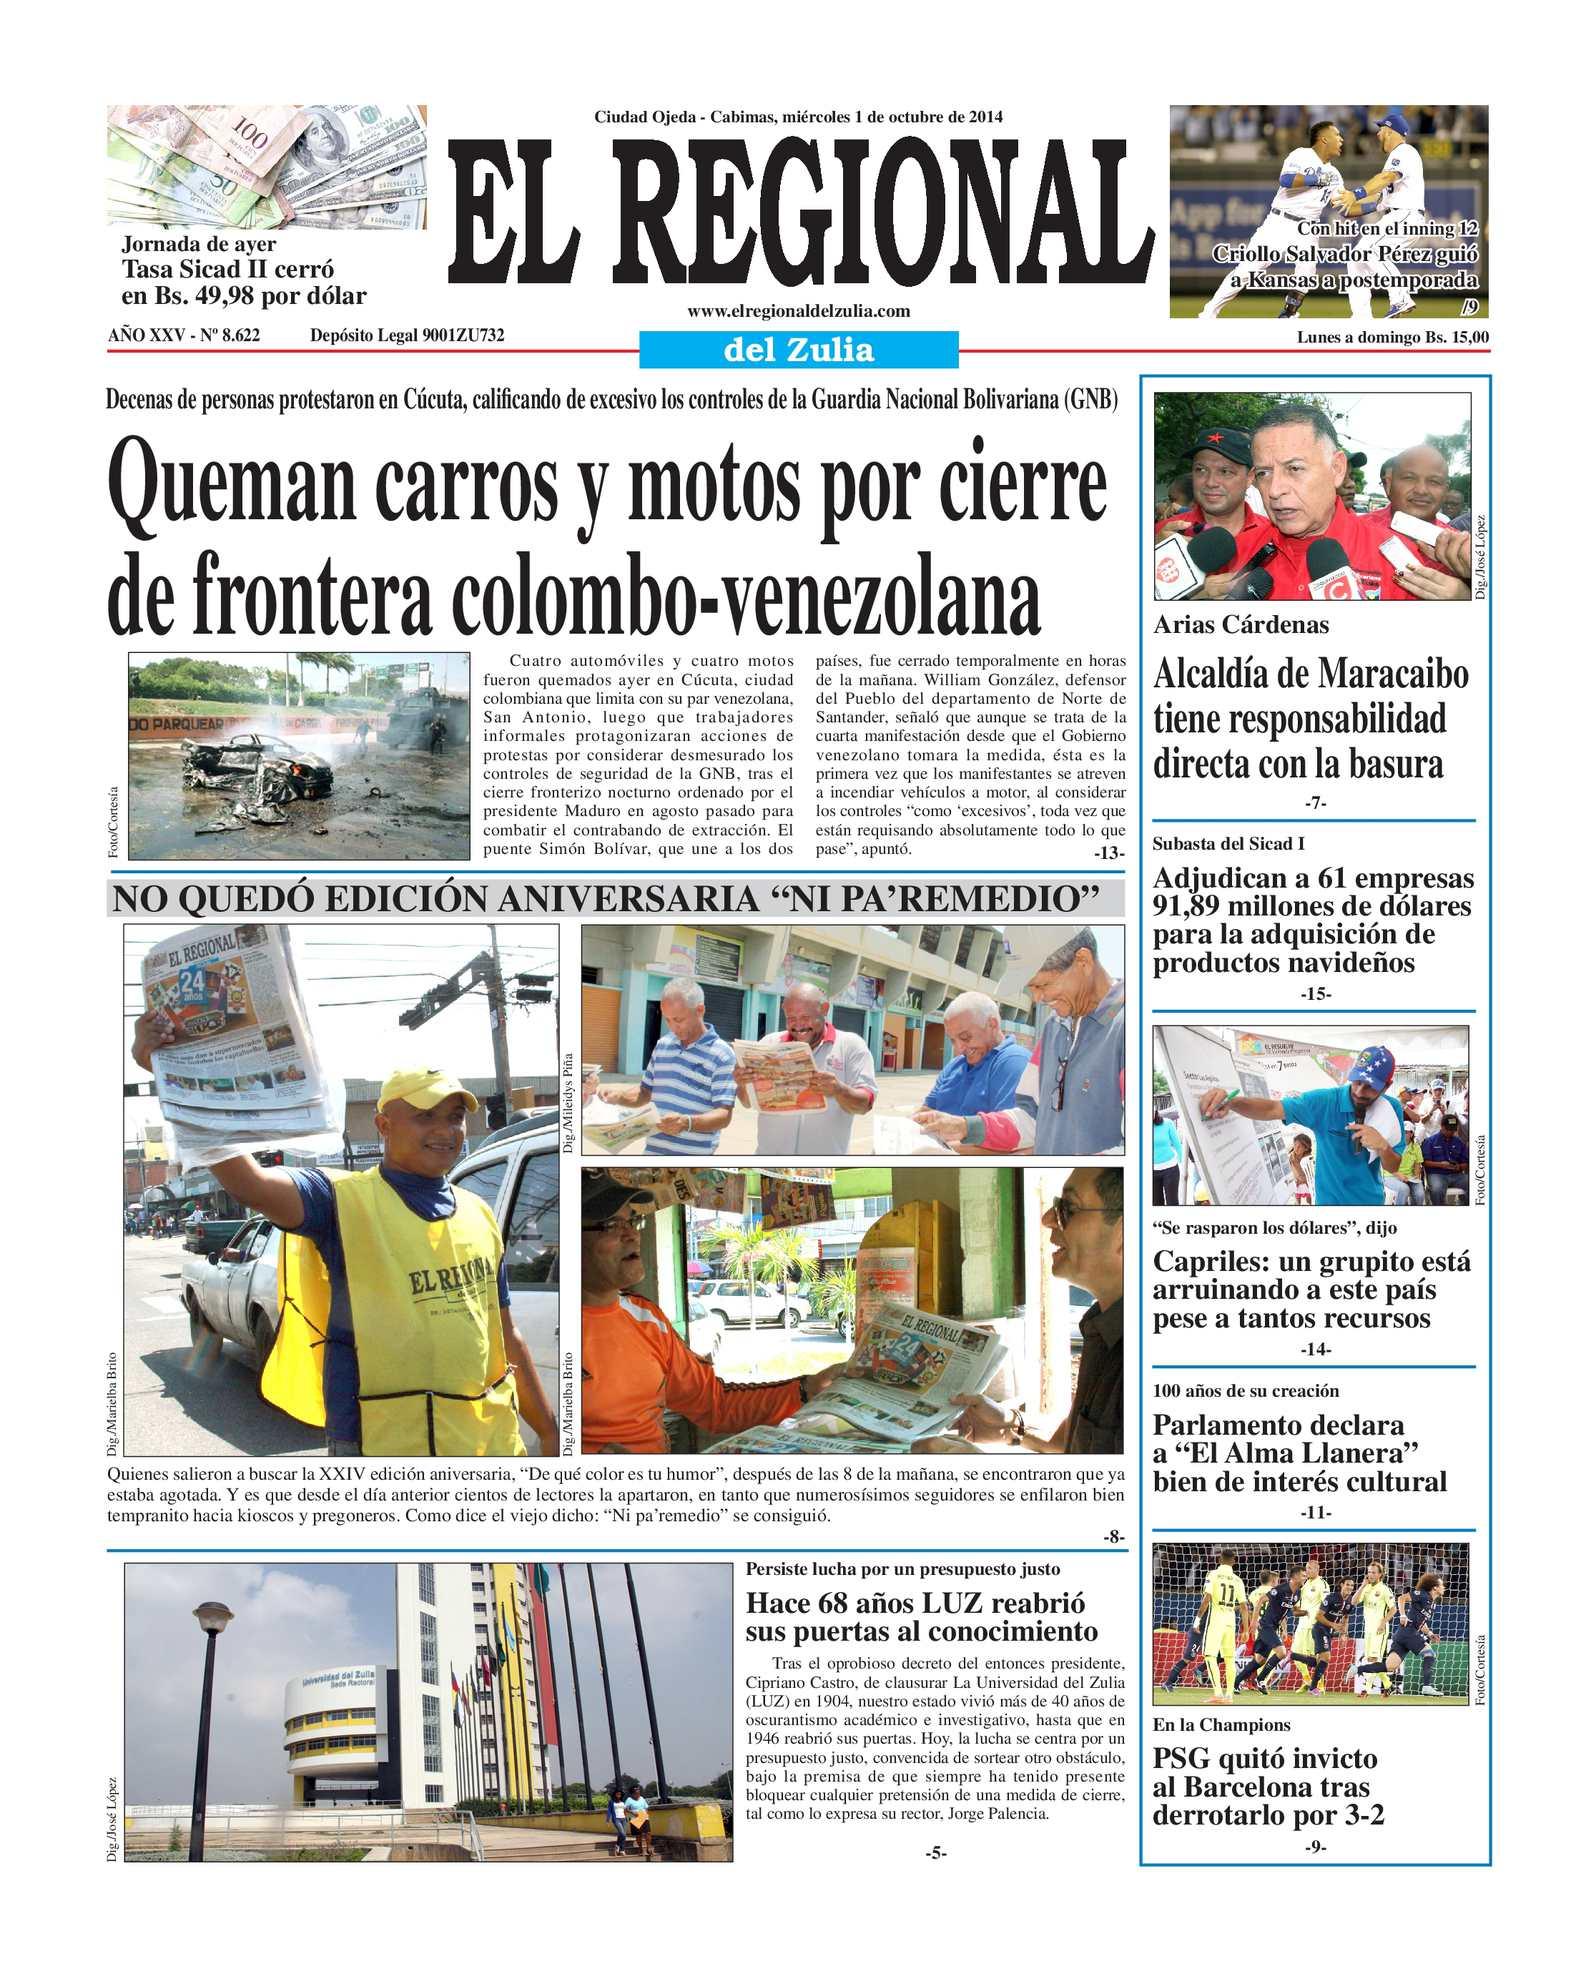 Calaméo - El Regional del Zulia 01-10-2014